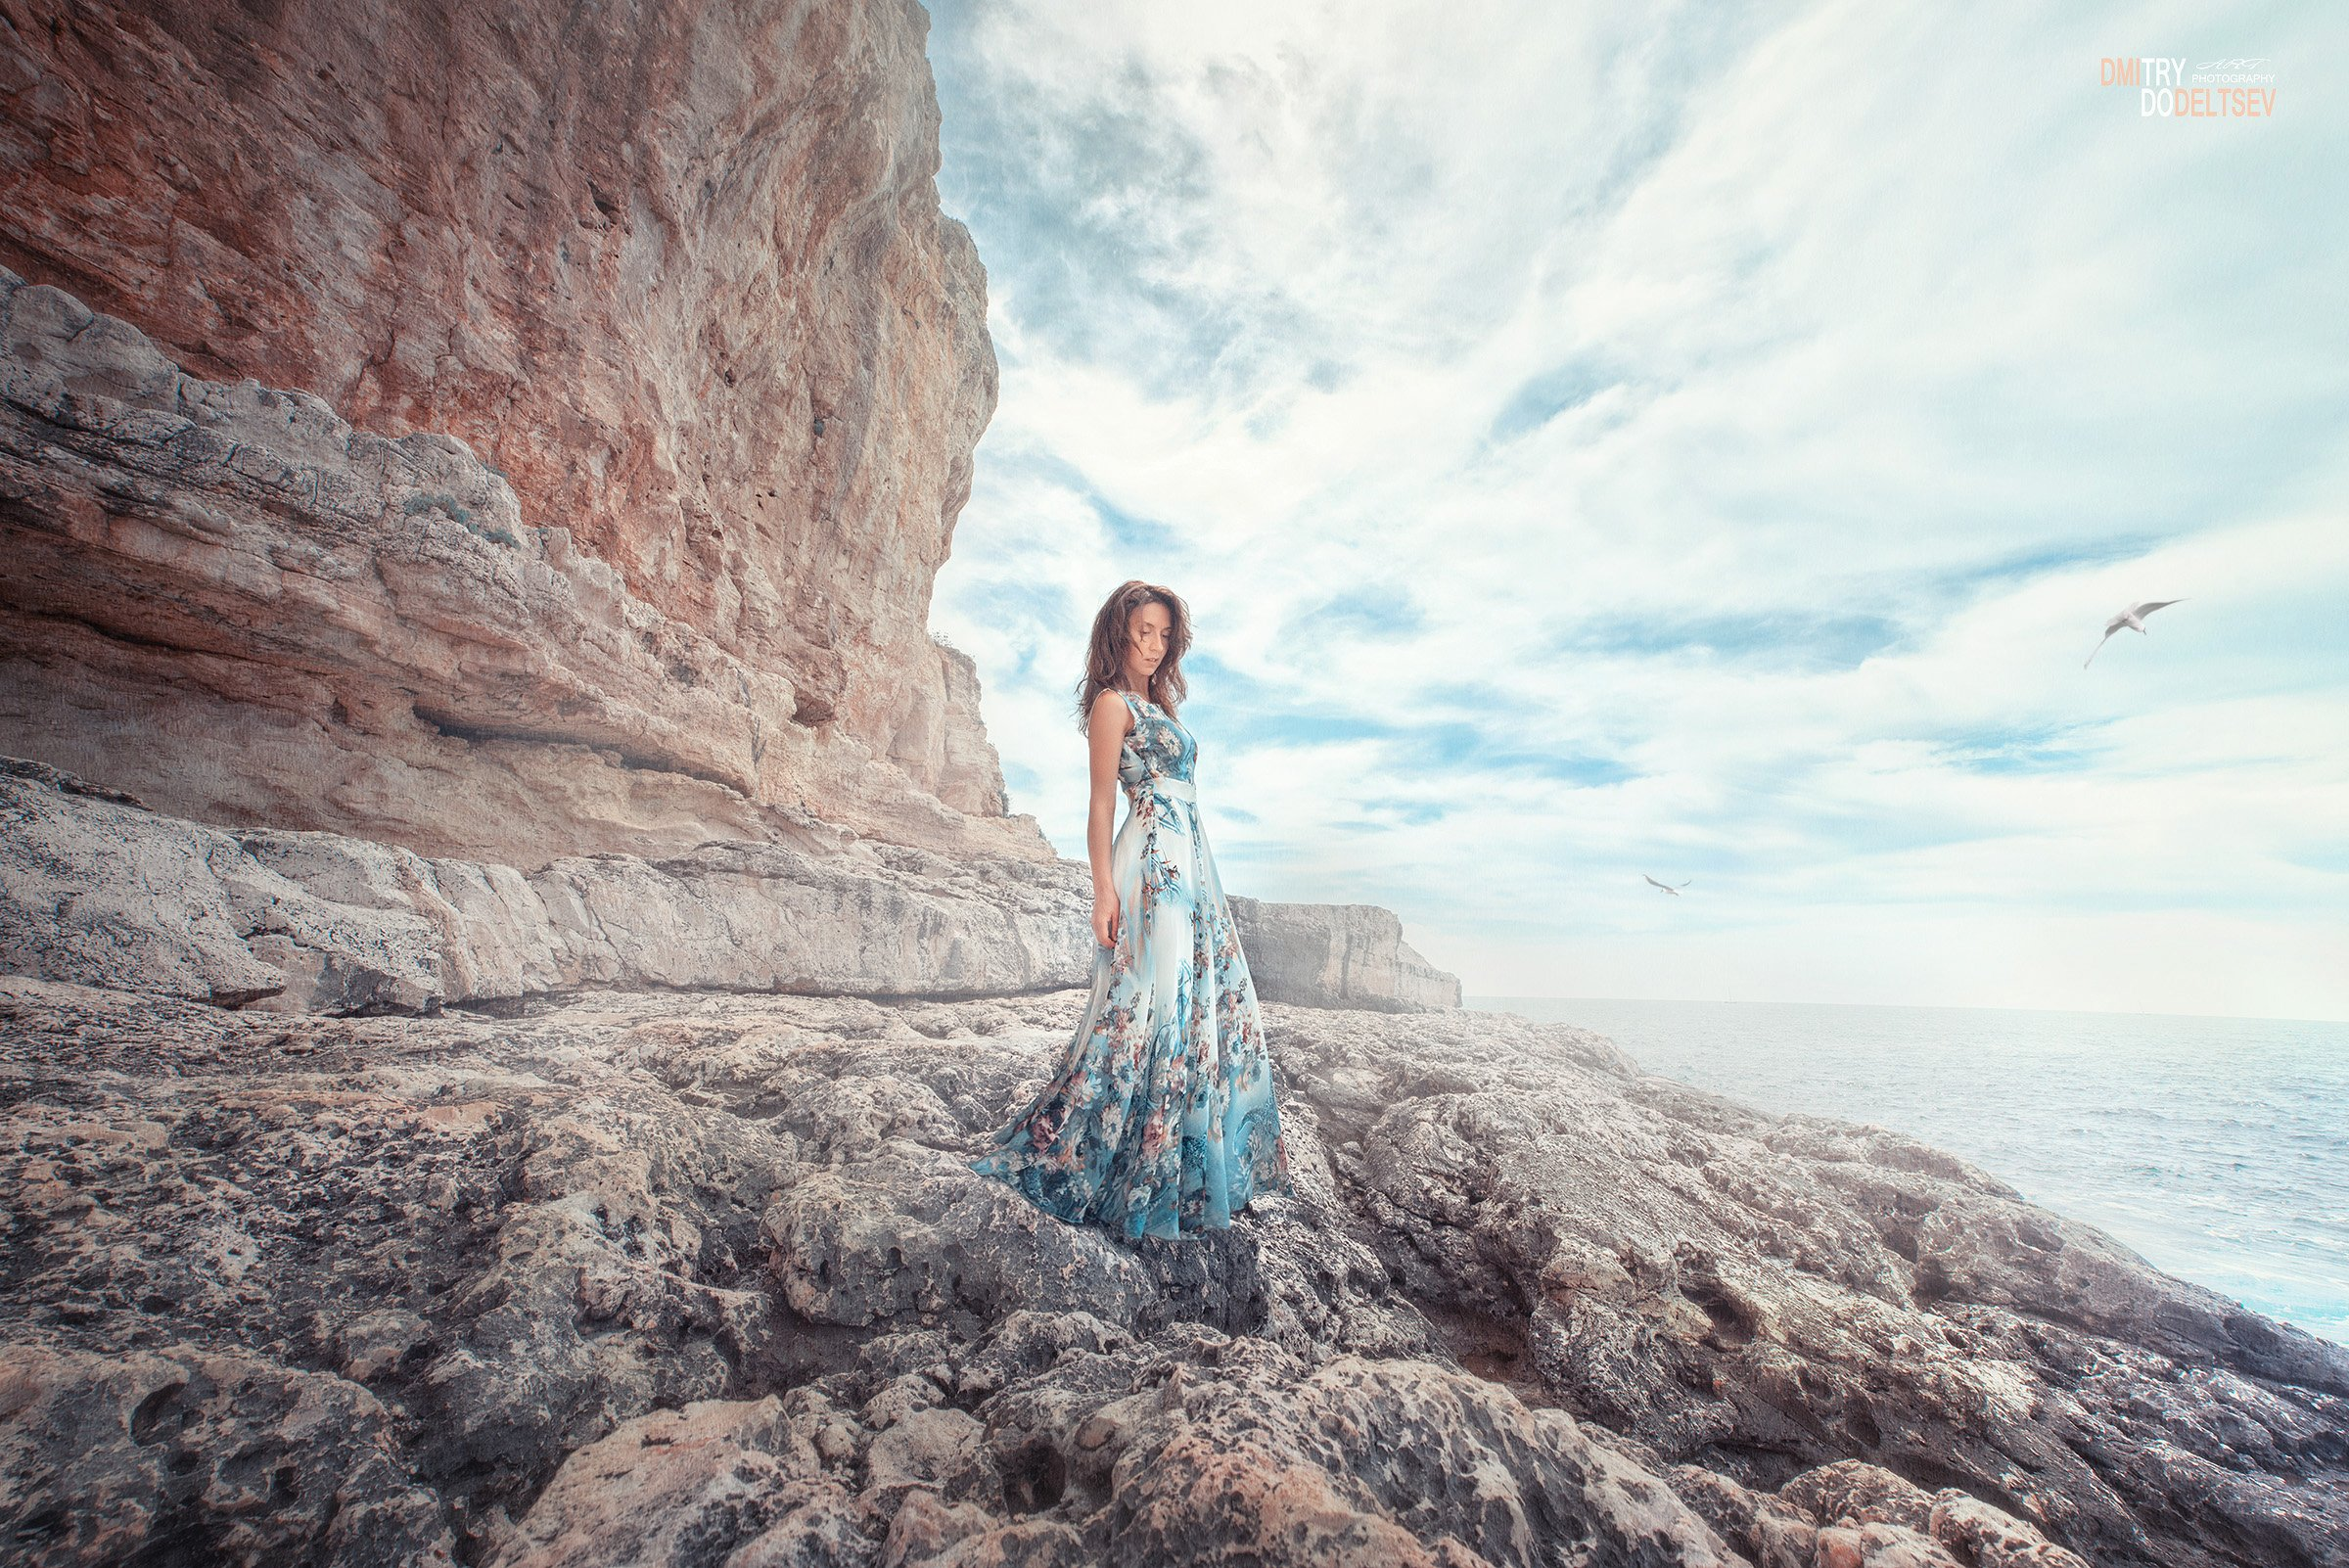 скалы, берег, море, девушка, камни, небо, чайки, облака, Дмитрий Додельцев